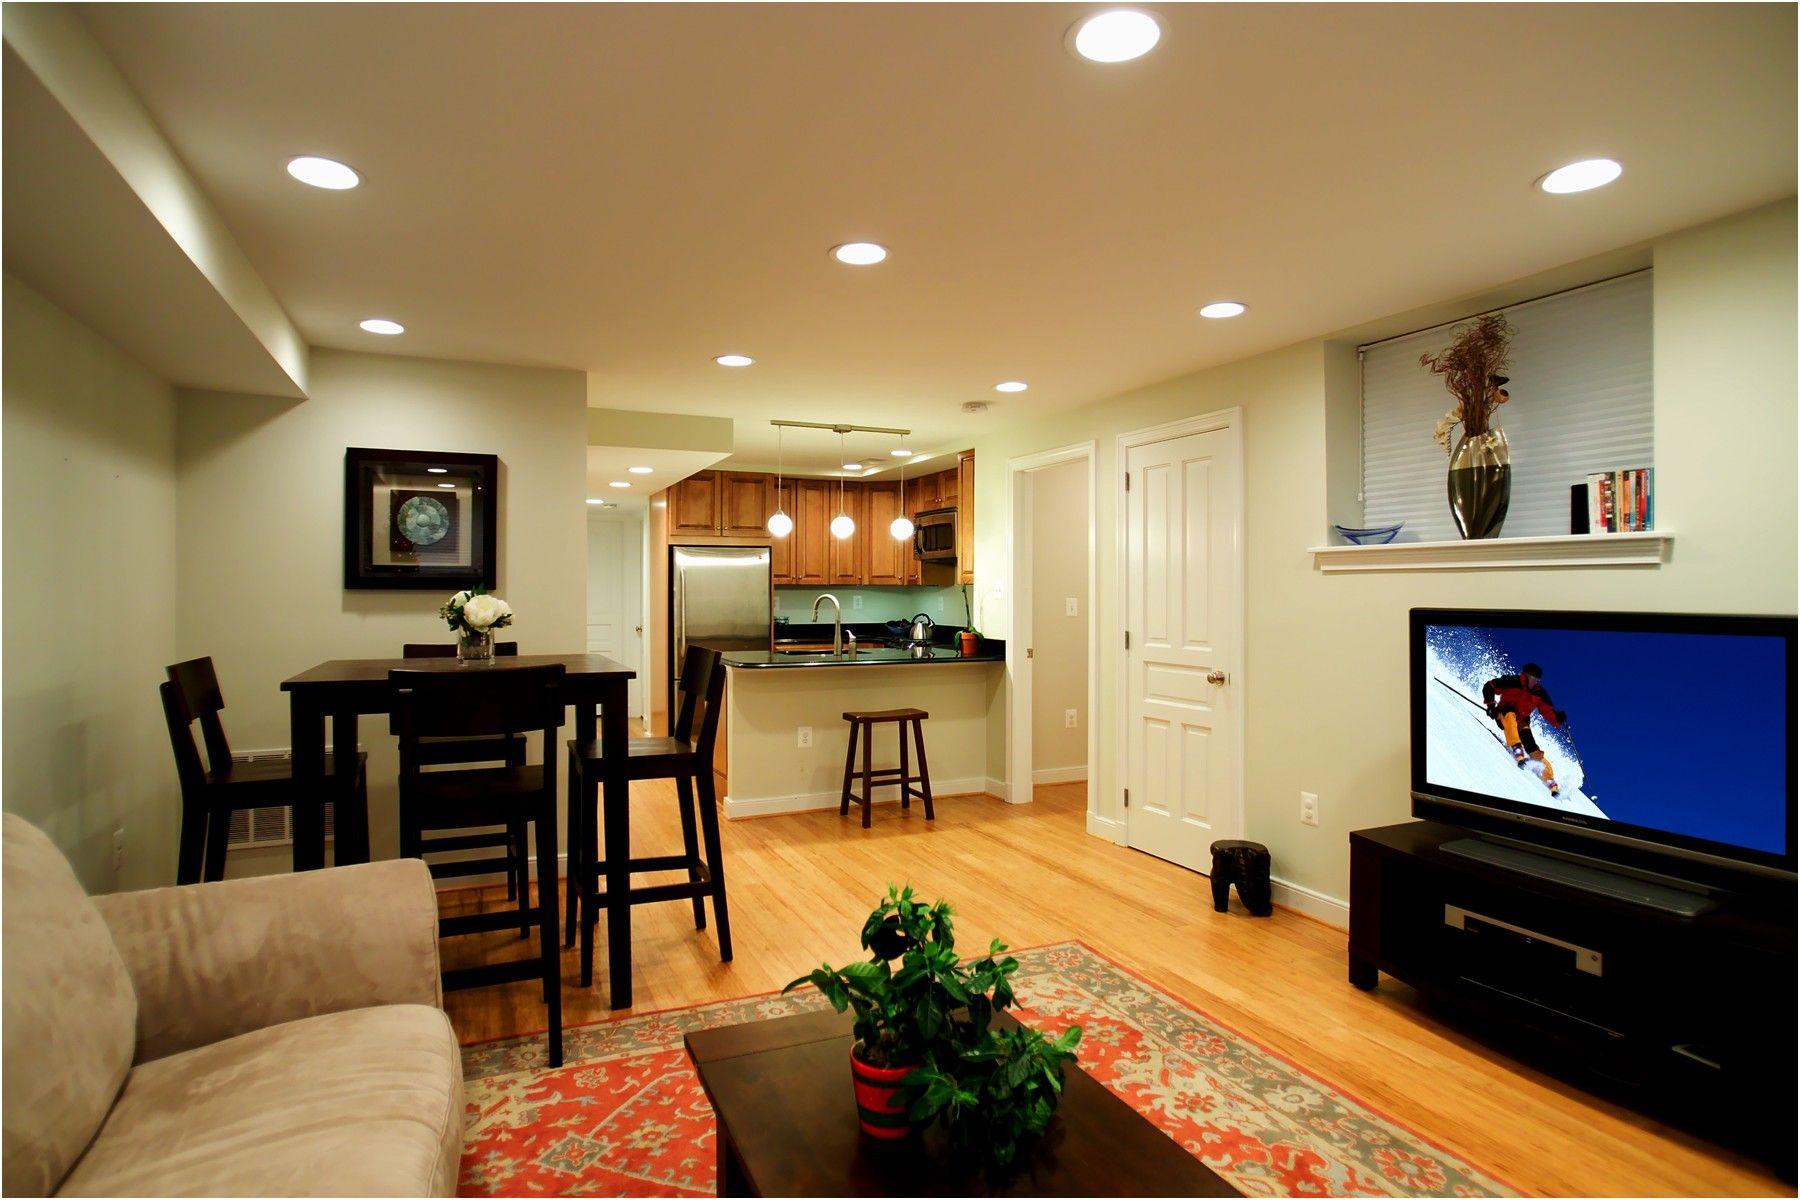 Basement Apartment Design A Basement Apartmentdesign A Basement From Basement Apartments For Rent In Ajax